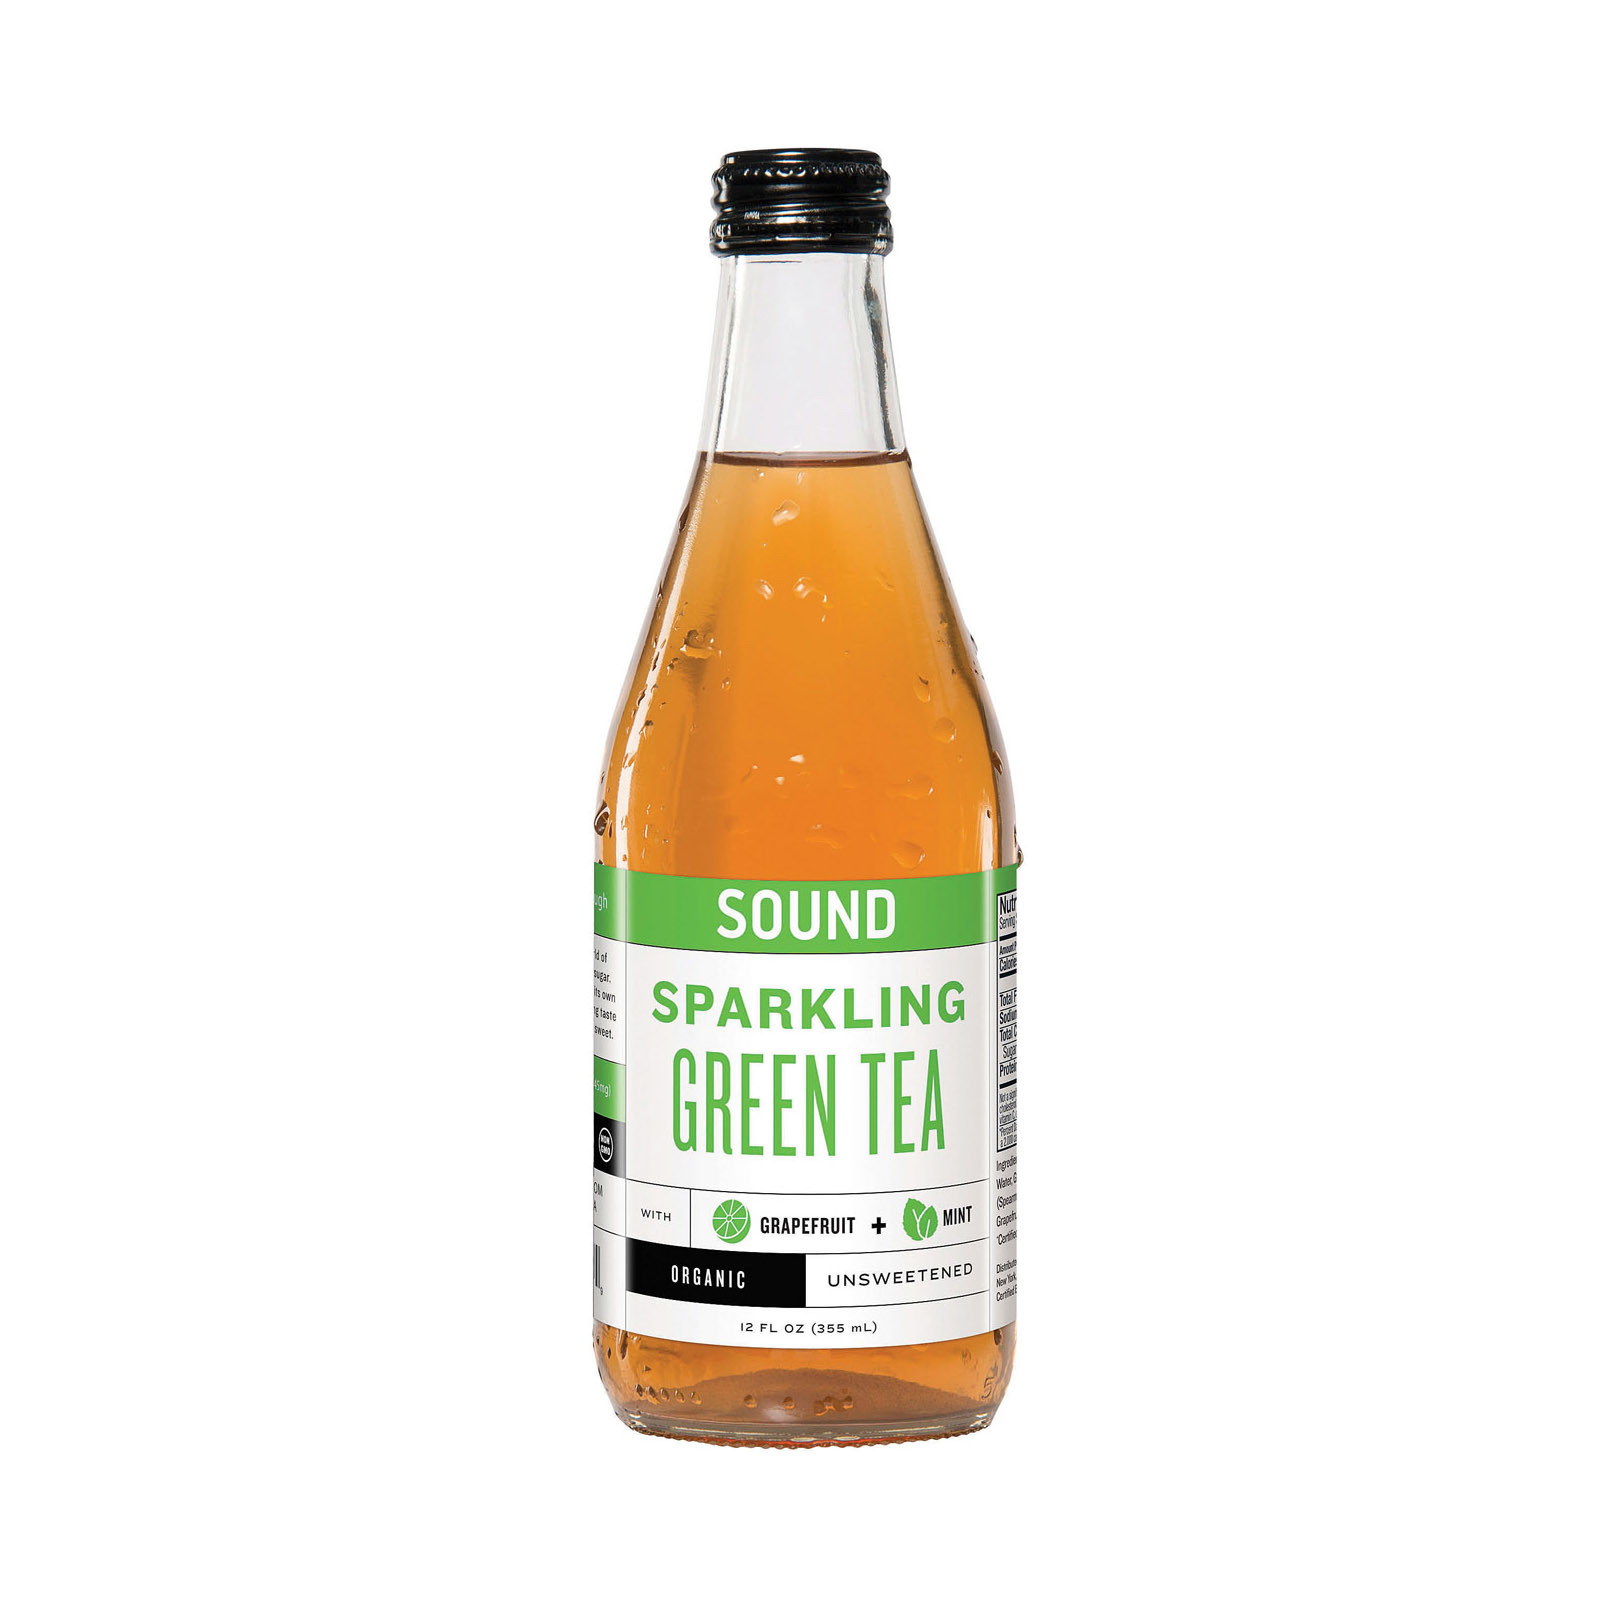 Sound Sparkling Tea Tea - Organic - Sparkling - Green Tea - Case of 12 - 12 fl oz